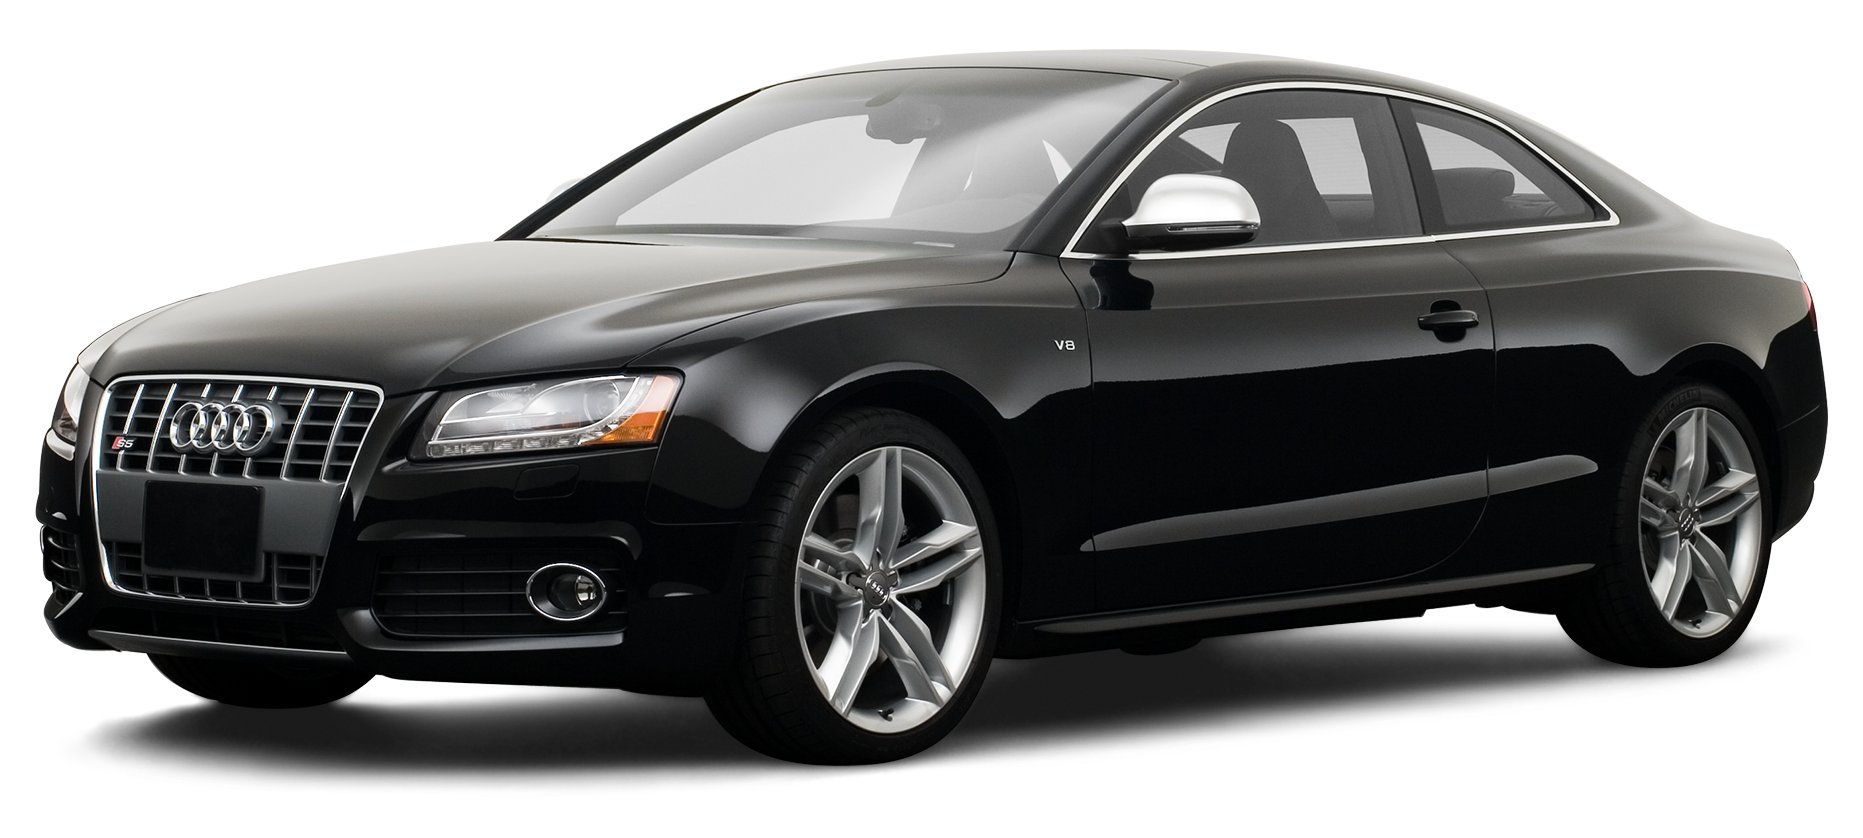 ... Transmission quattro, 2008 Audi S5, 2-Door Coupe Automatic Transmission